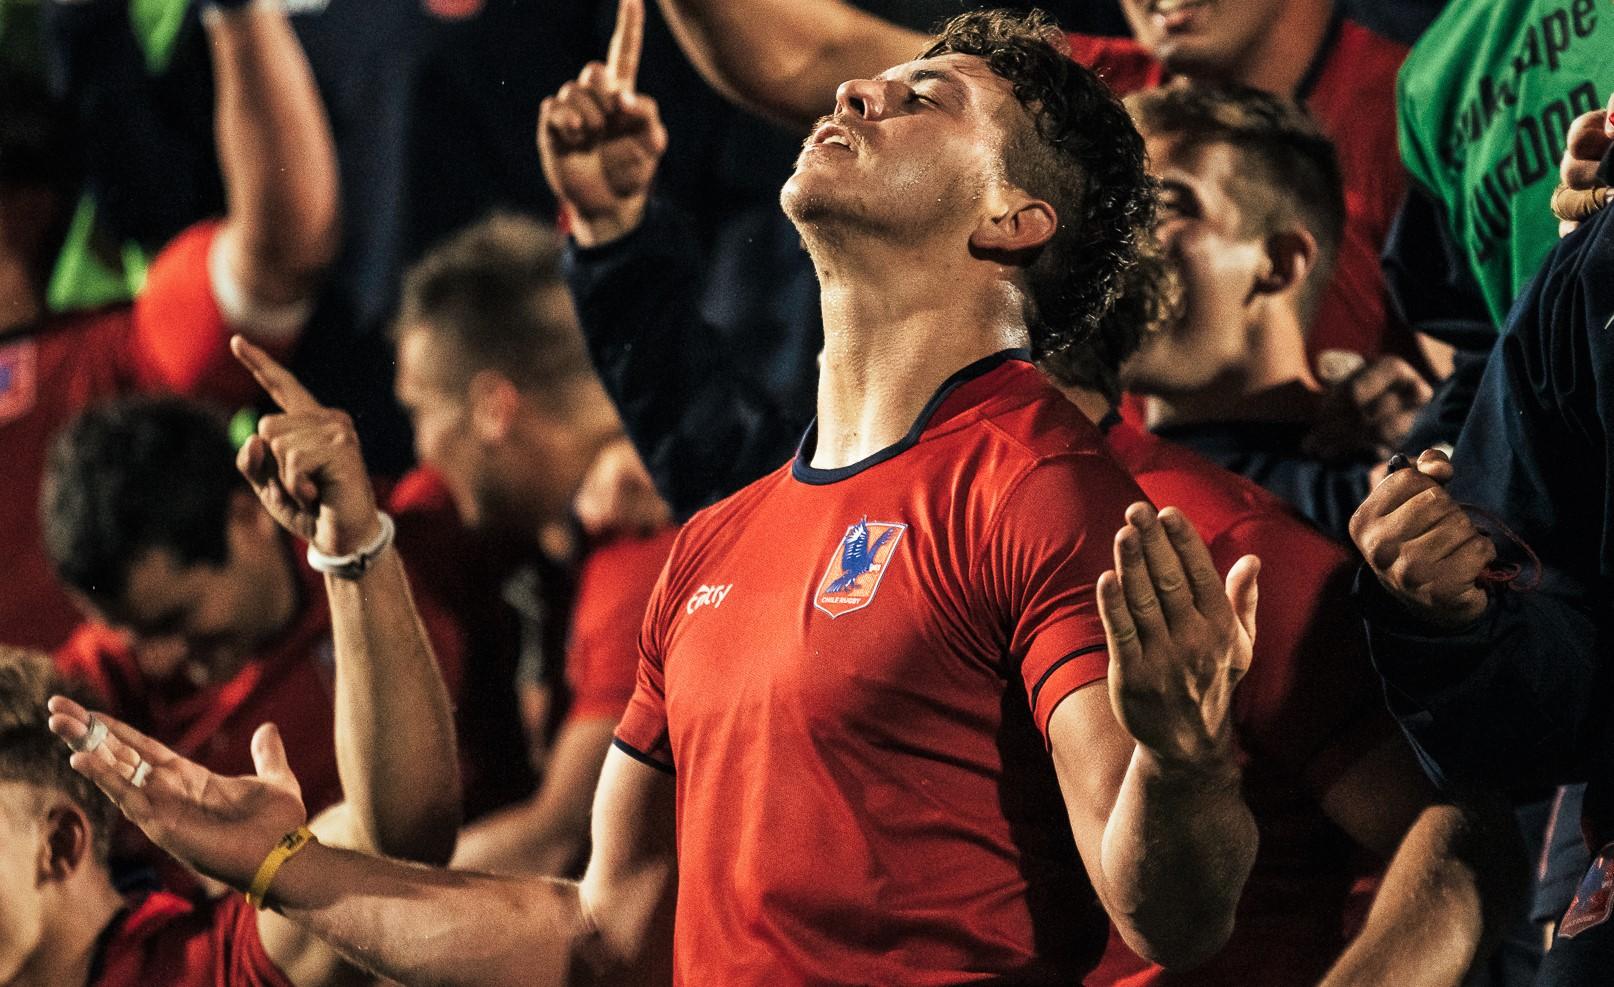 Chile XV lo ganó gracias a la defensa